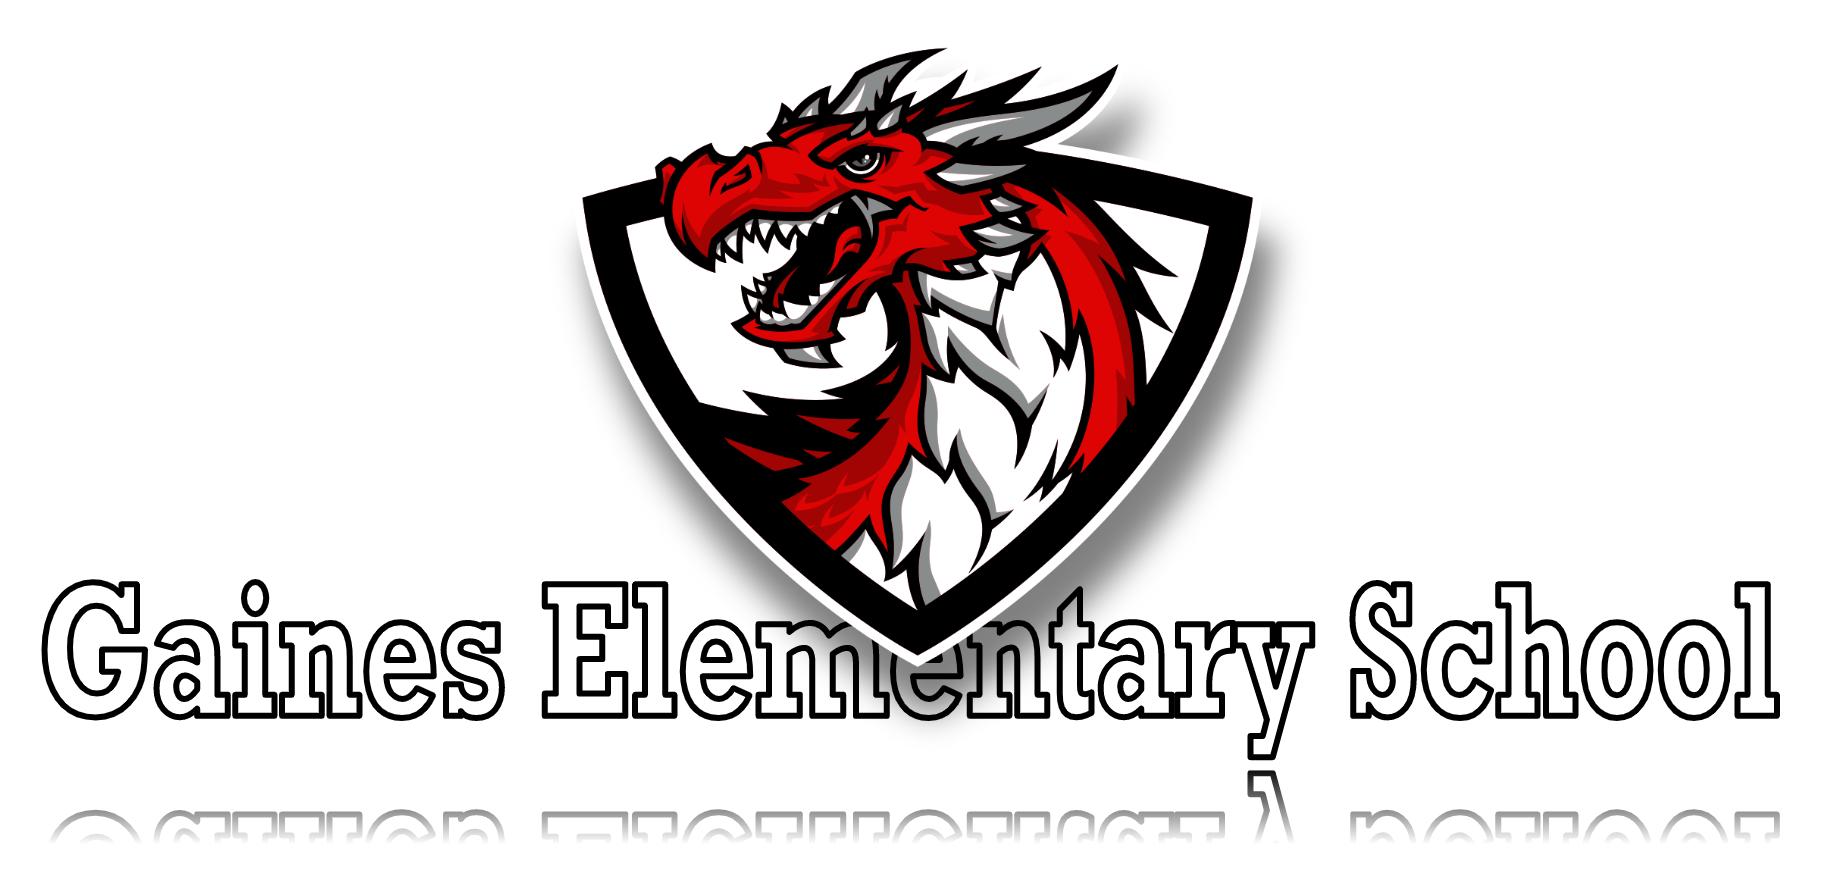 School Mascot with School Title